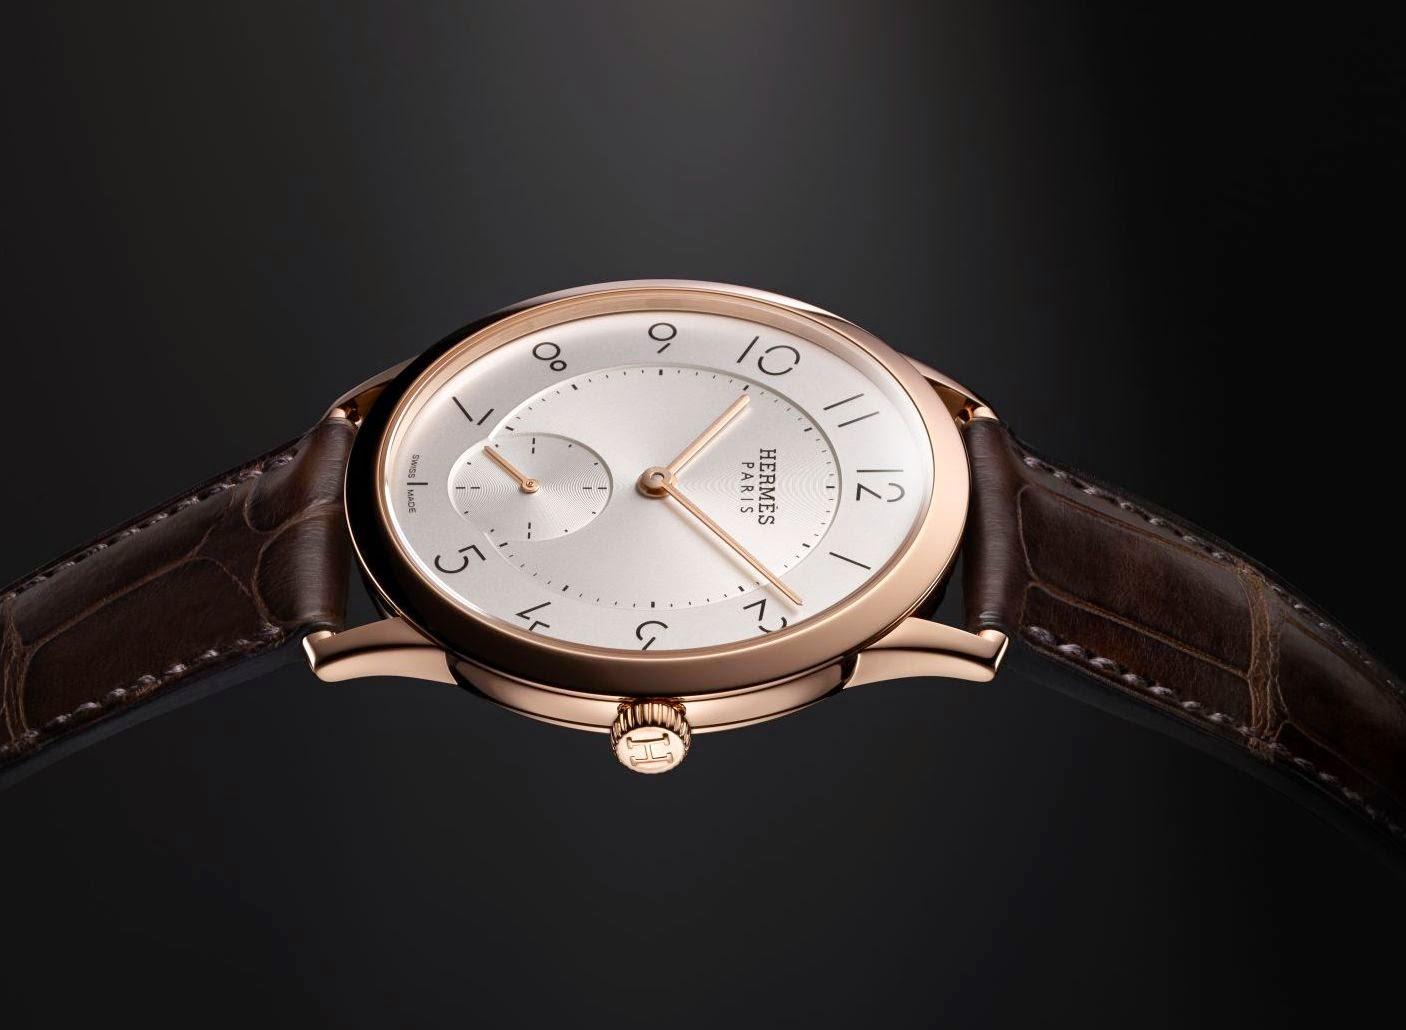 Hermès - Slim d'Hermès Petite Seconds Automatic watch with rose gold case